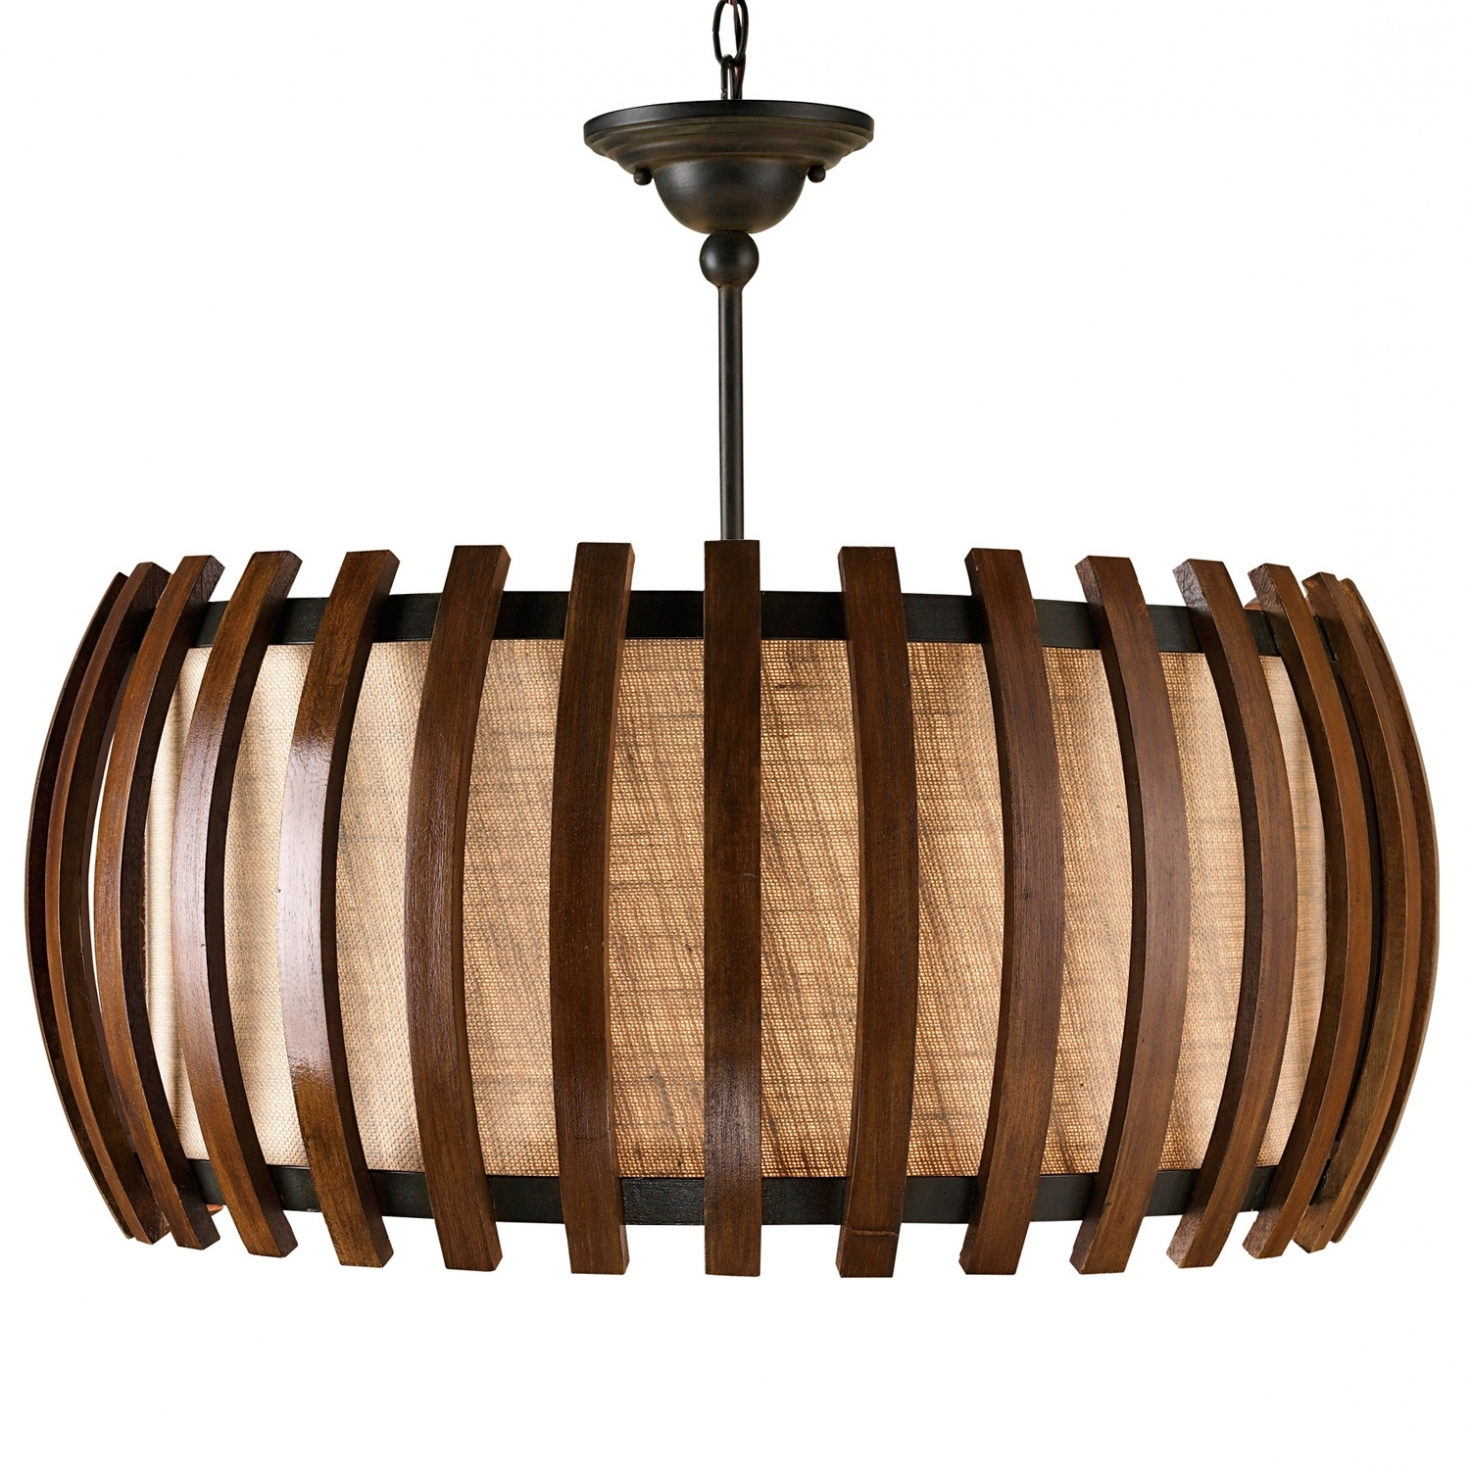 Modern Wooden Chandeliers – Chandelier Designs For 2018 Wooden Chandeliers (View 10 of 15)